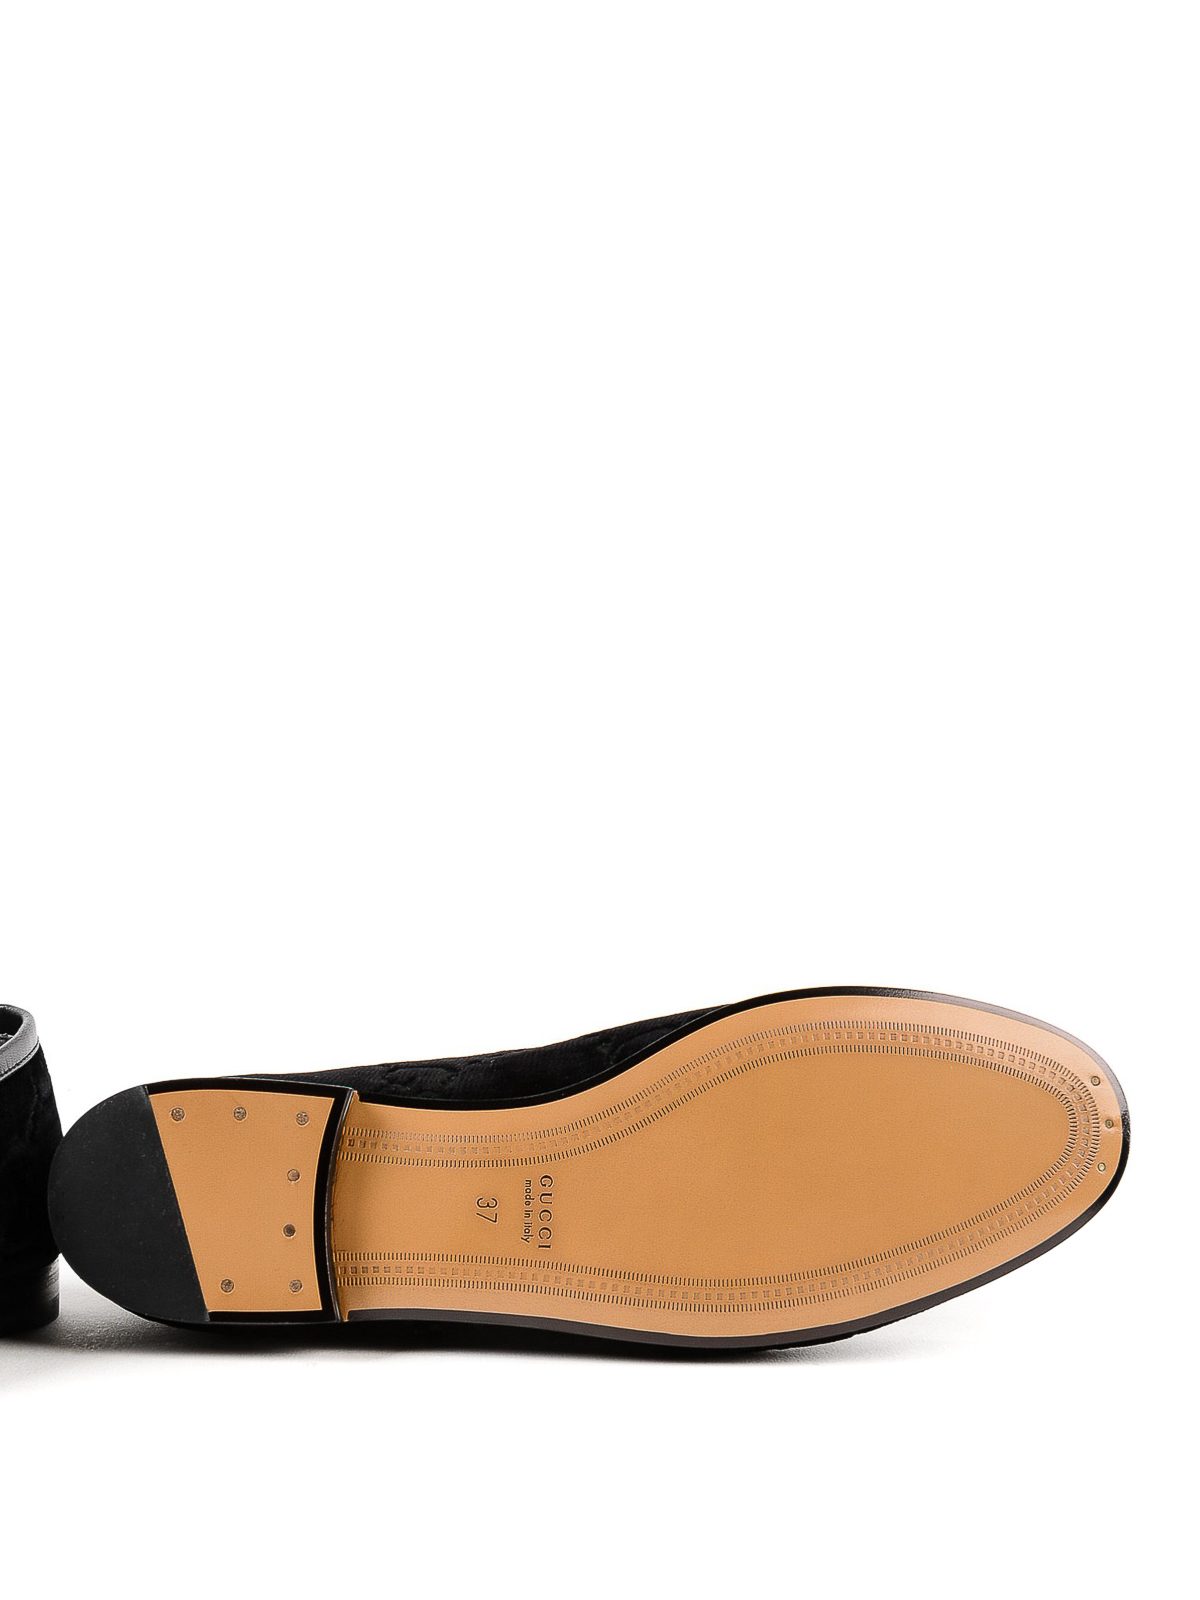 70f8a2428b9 Gucci - Jordaan GG black velvet loafer - Loafers   Slippers ...